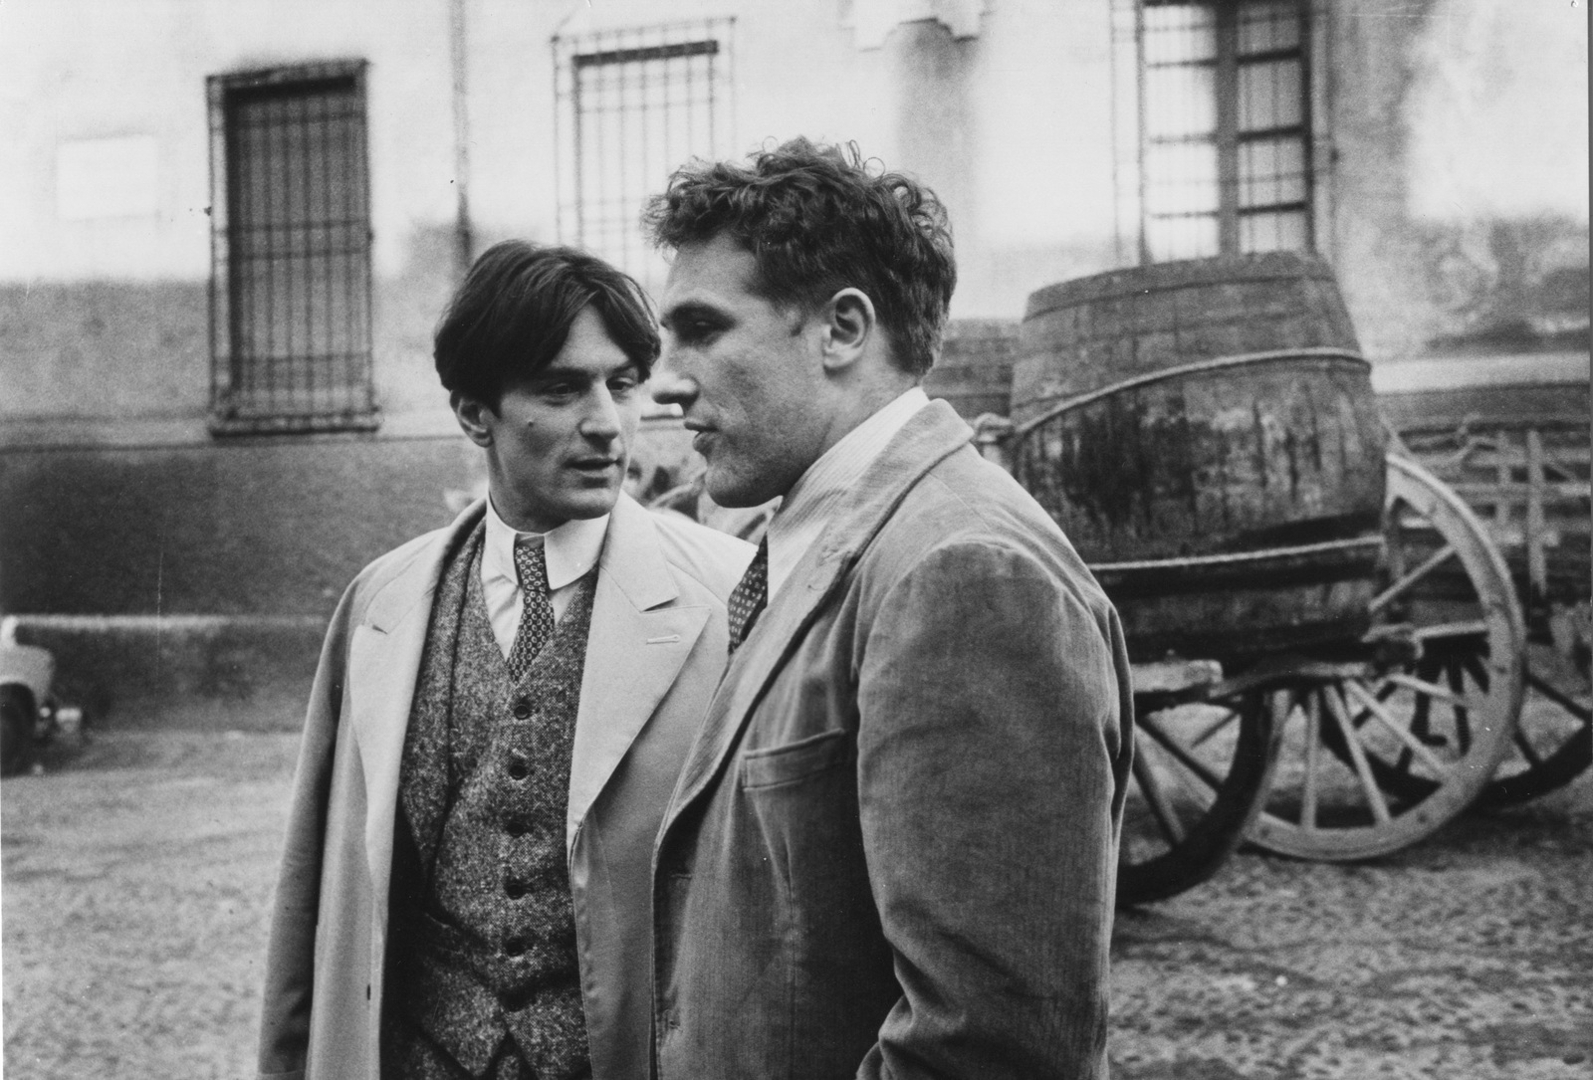 Novecento (1900). 1976 image